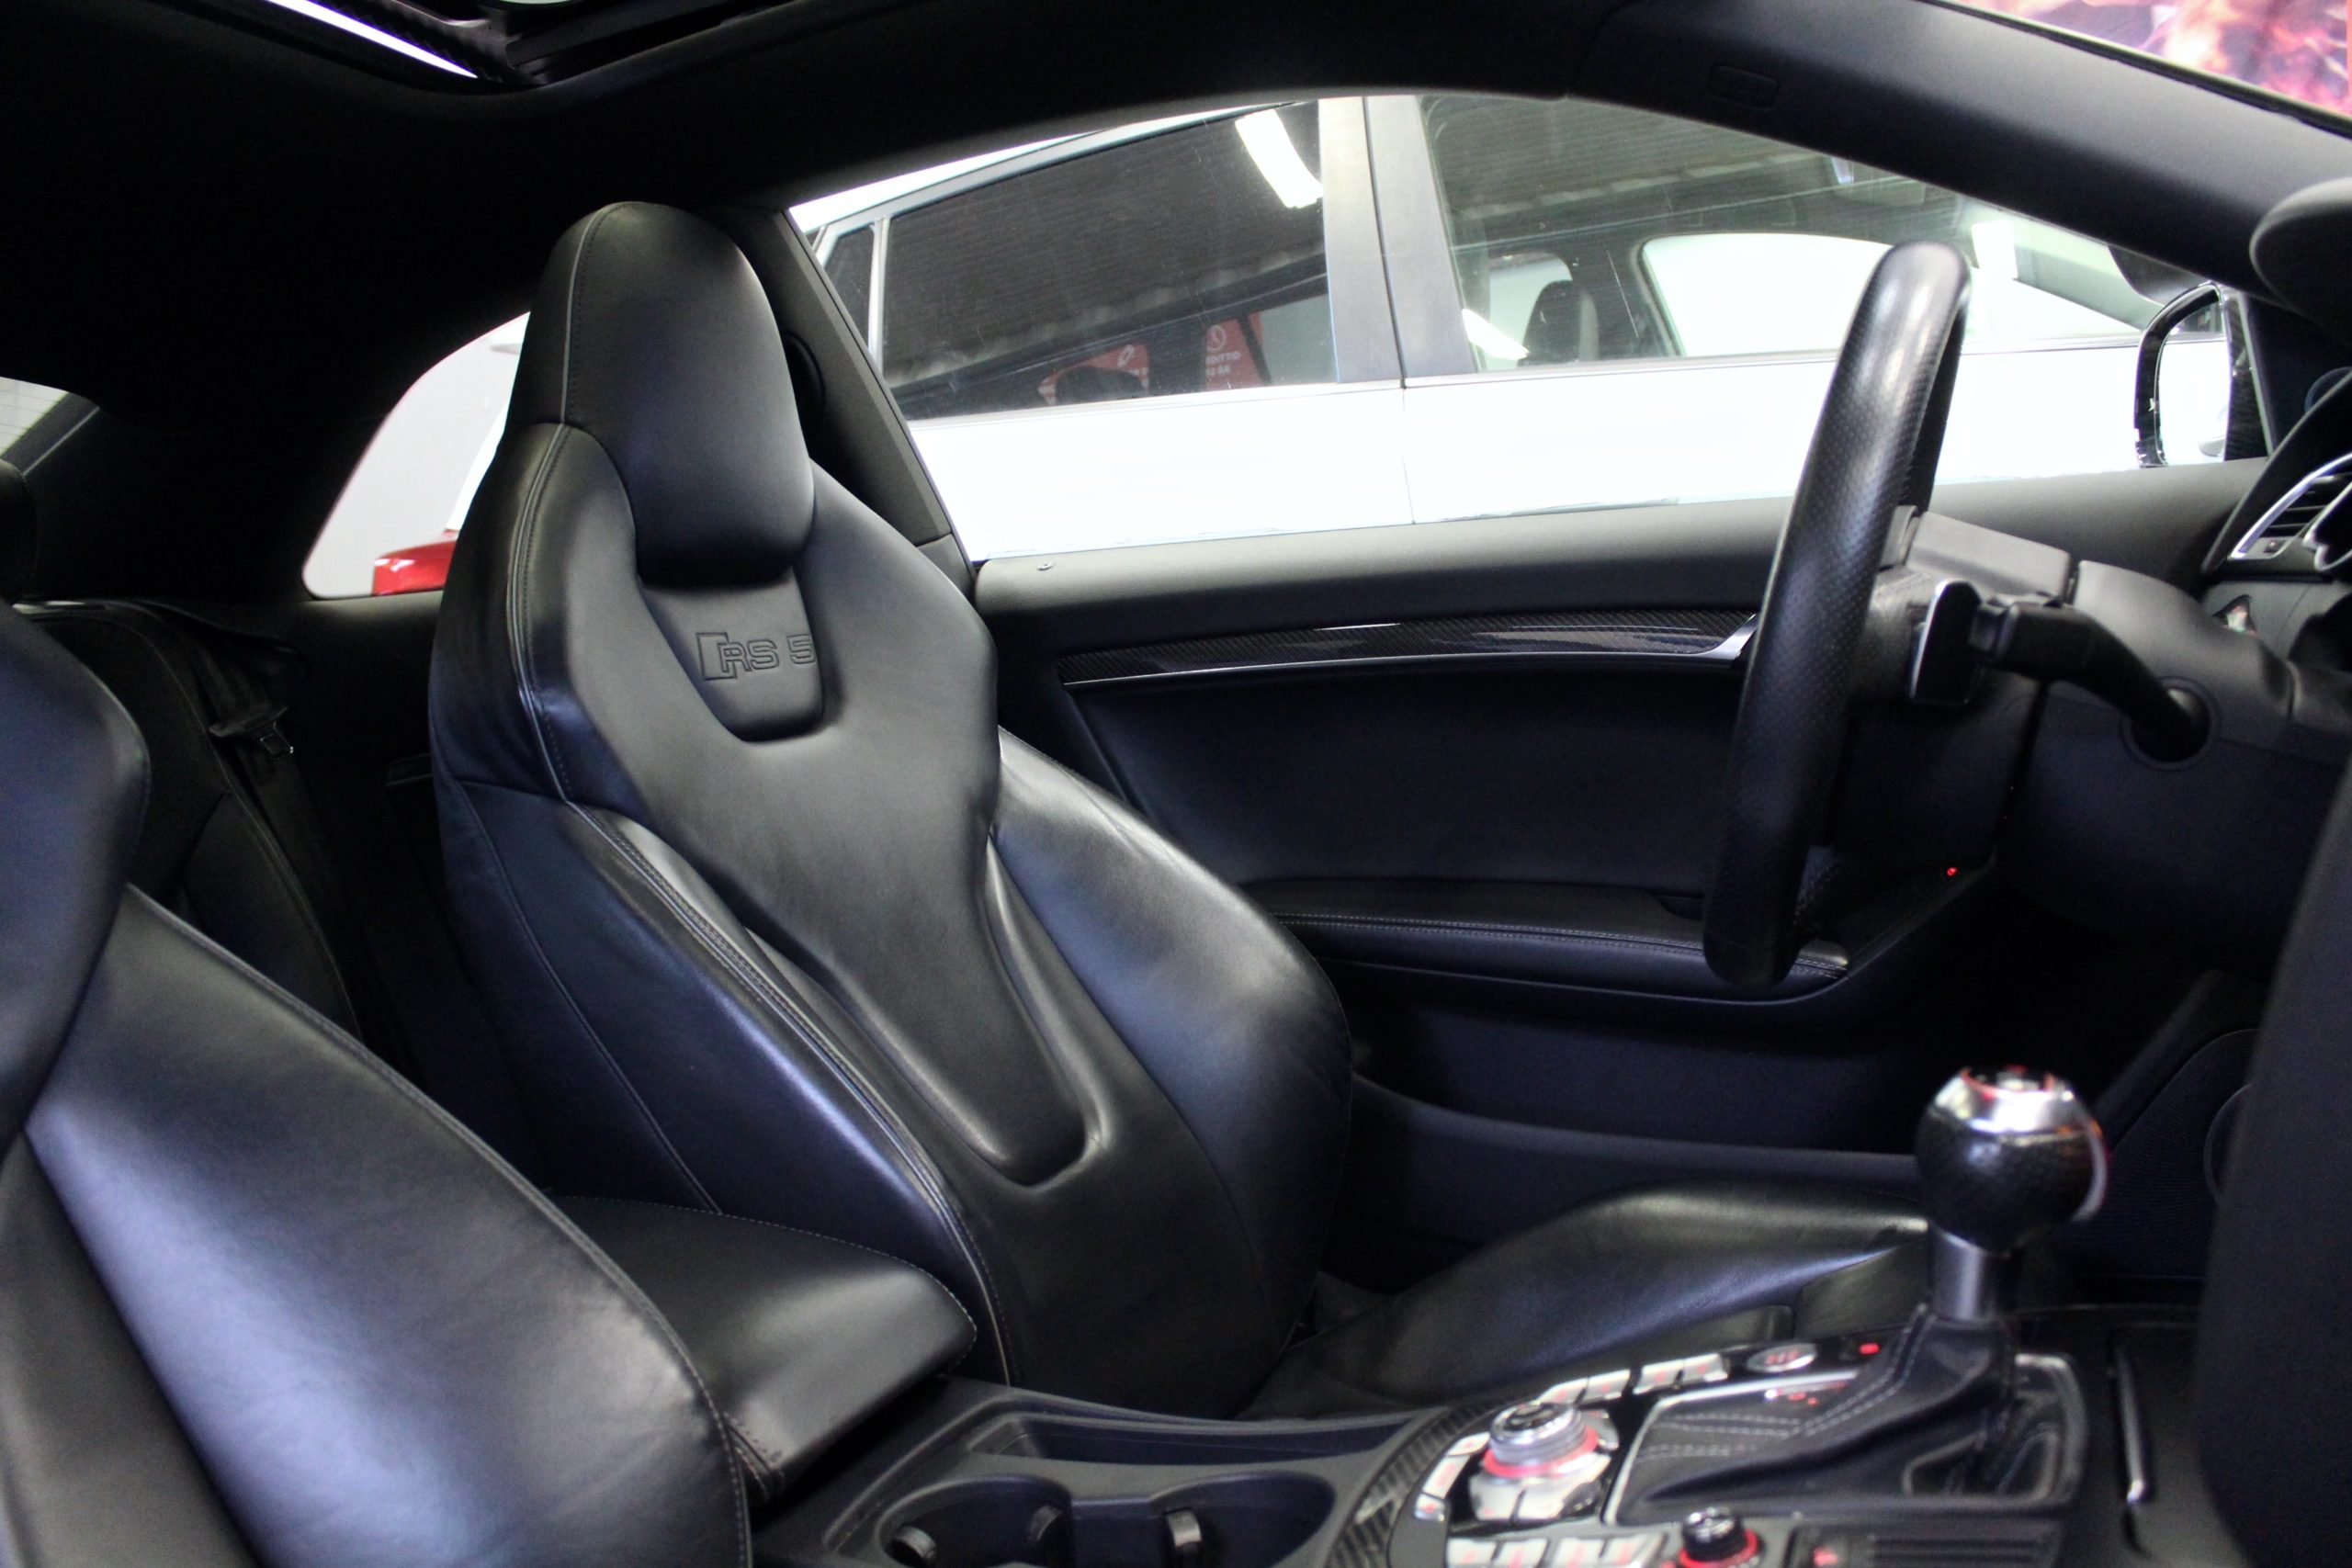 Audi RS5 Coupé 4.2 FSI V8 quattro Unikt Exemplar